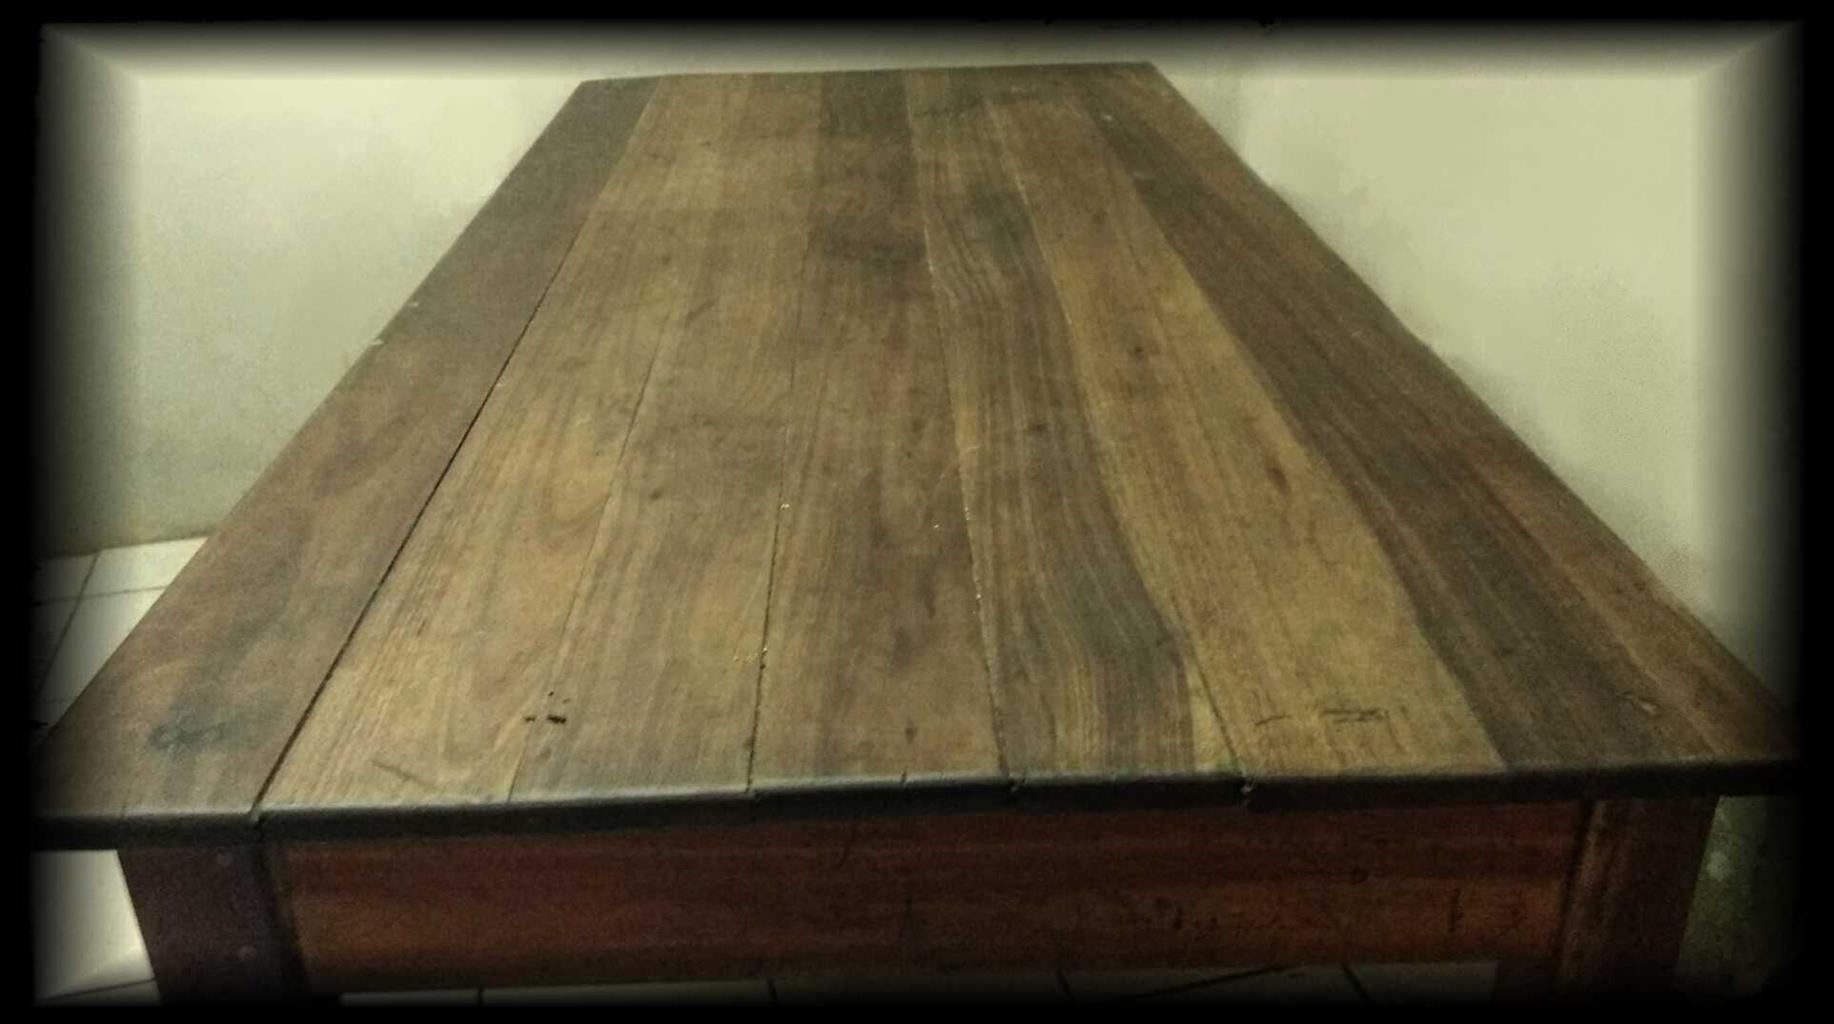 Antique Solid Teak Wood Table